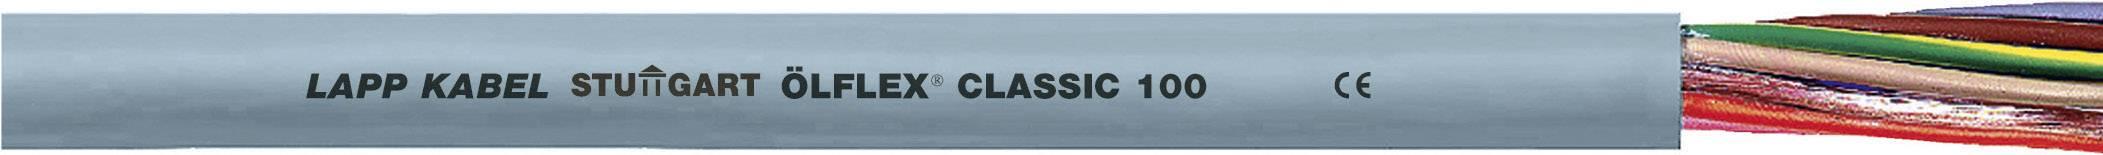 Kabel LappKabel Ölflex CLASSIC 100 3G1,5 (00100644), PVC, 6,7 mm, 750 V, šedá, 300 m